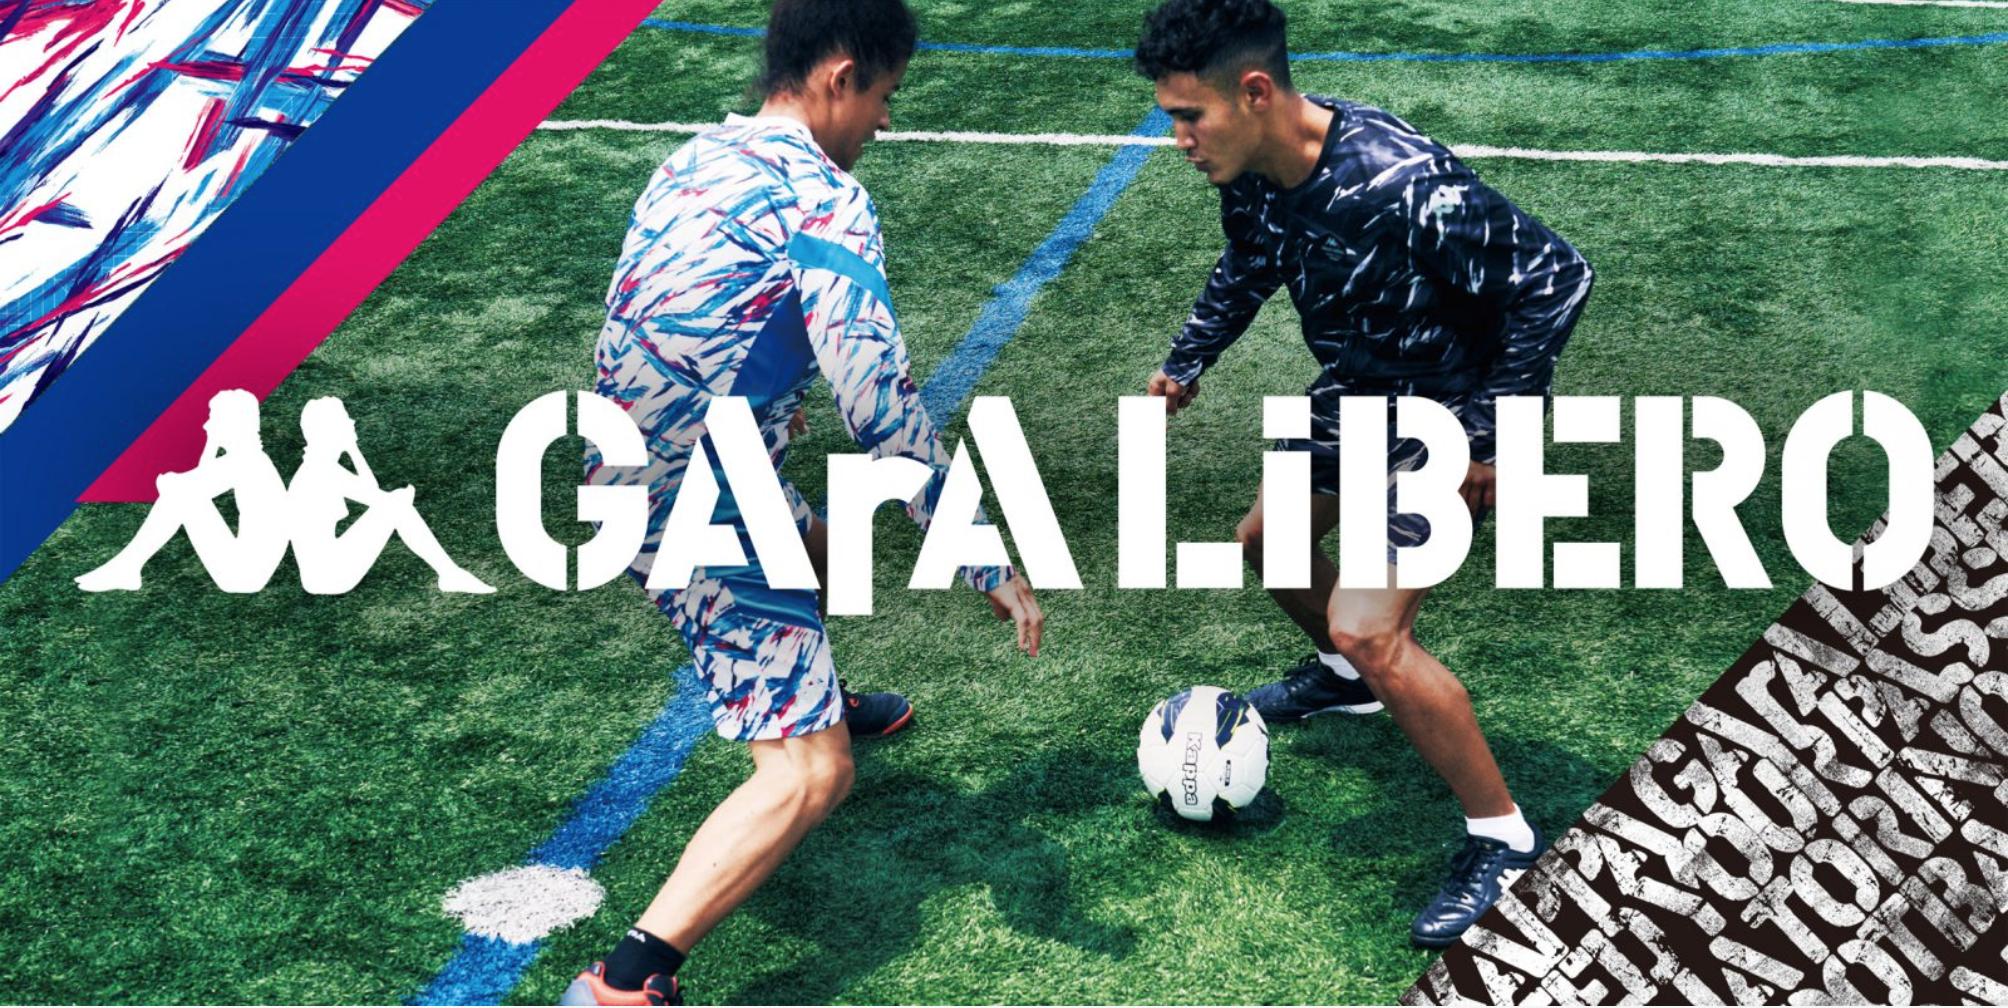 Kappa FOOTBALL「GArA LiBERO」/ 2020 A/W